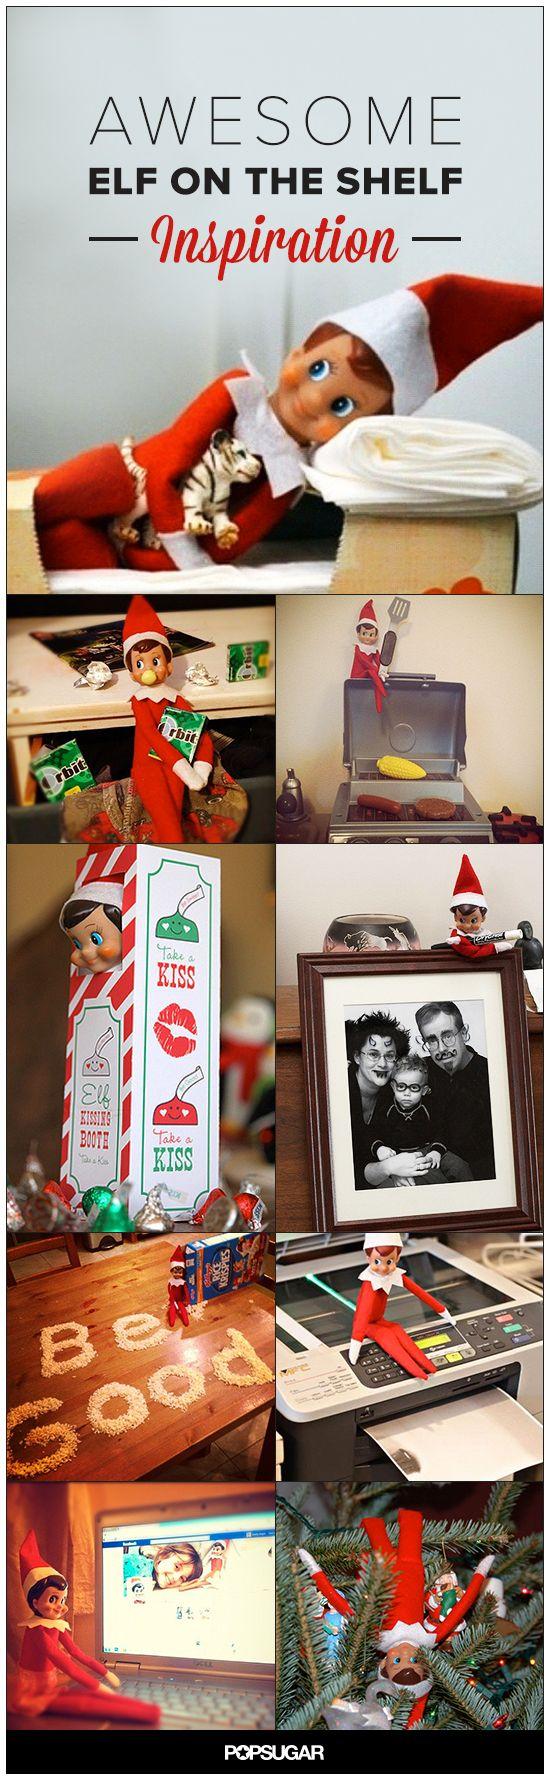 60+ Awesome Elf on the Shelf Ideas